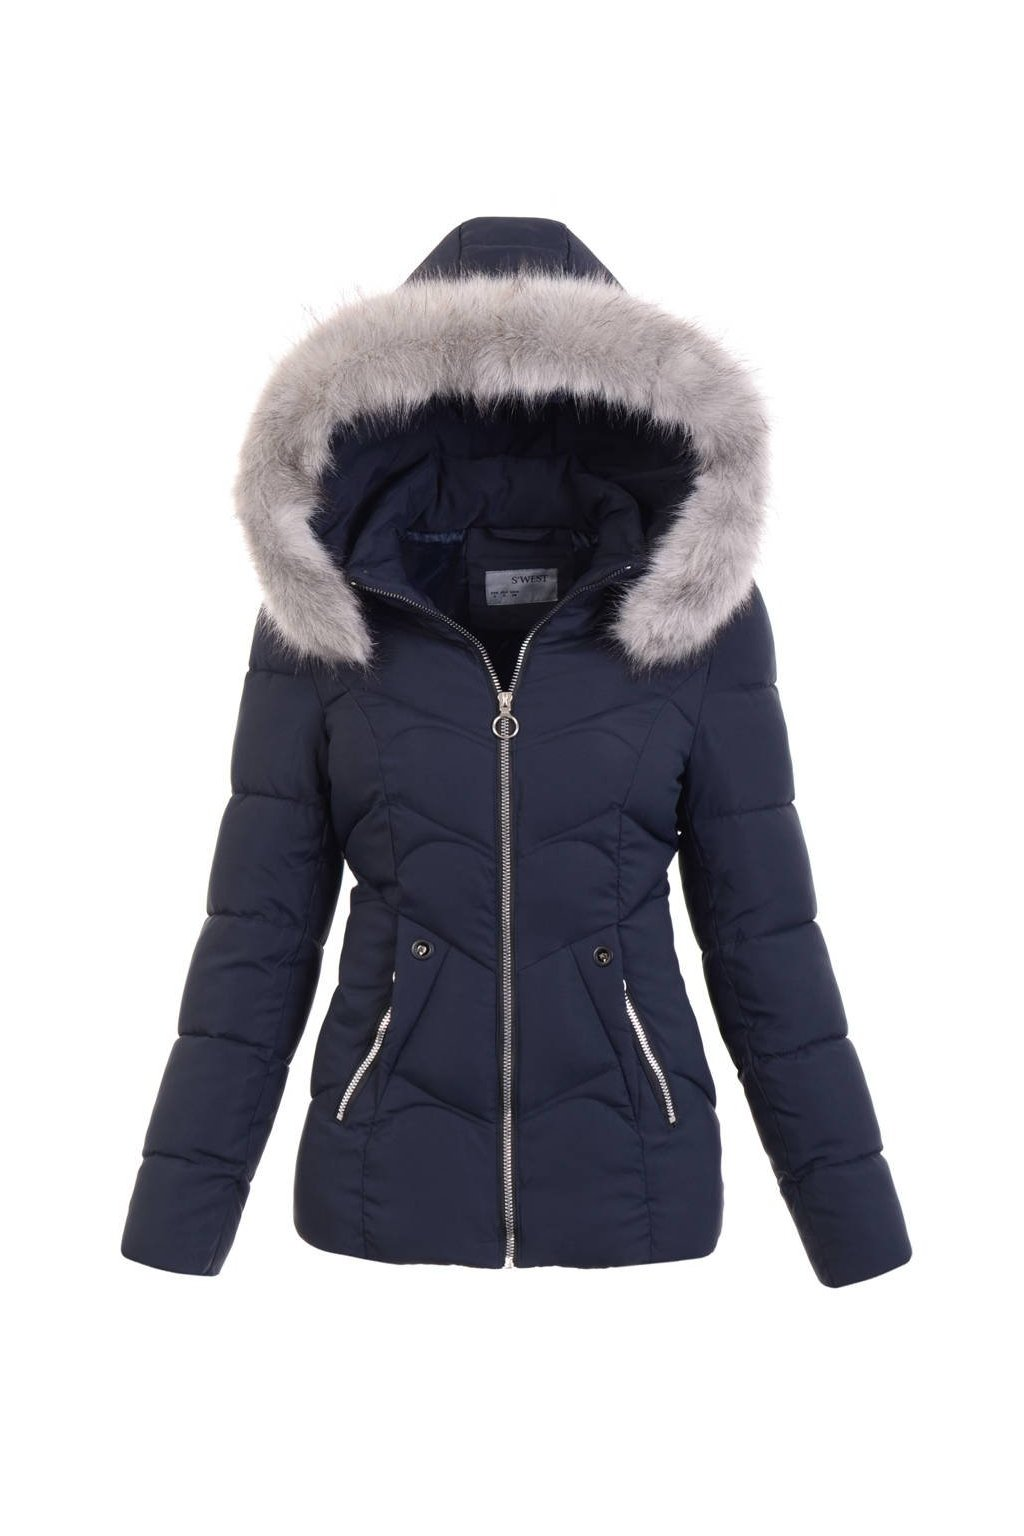 Dámska zimná bunda s kapucňou 5134 modrá